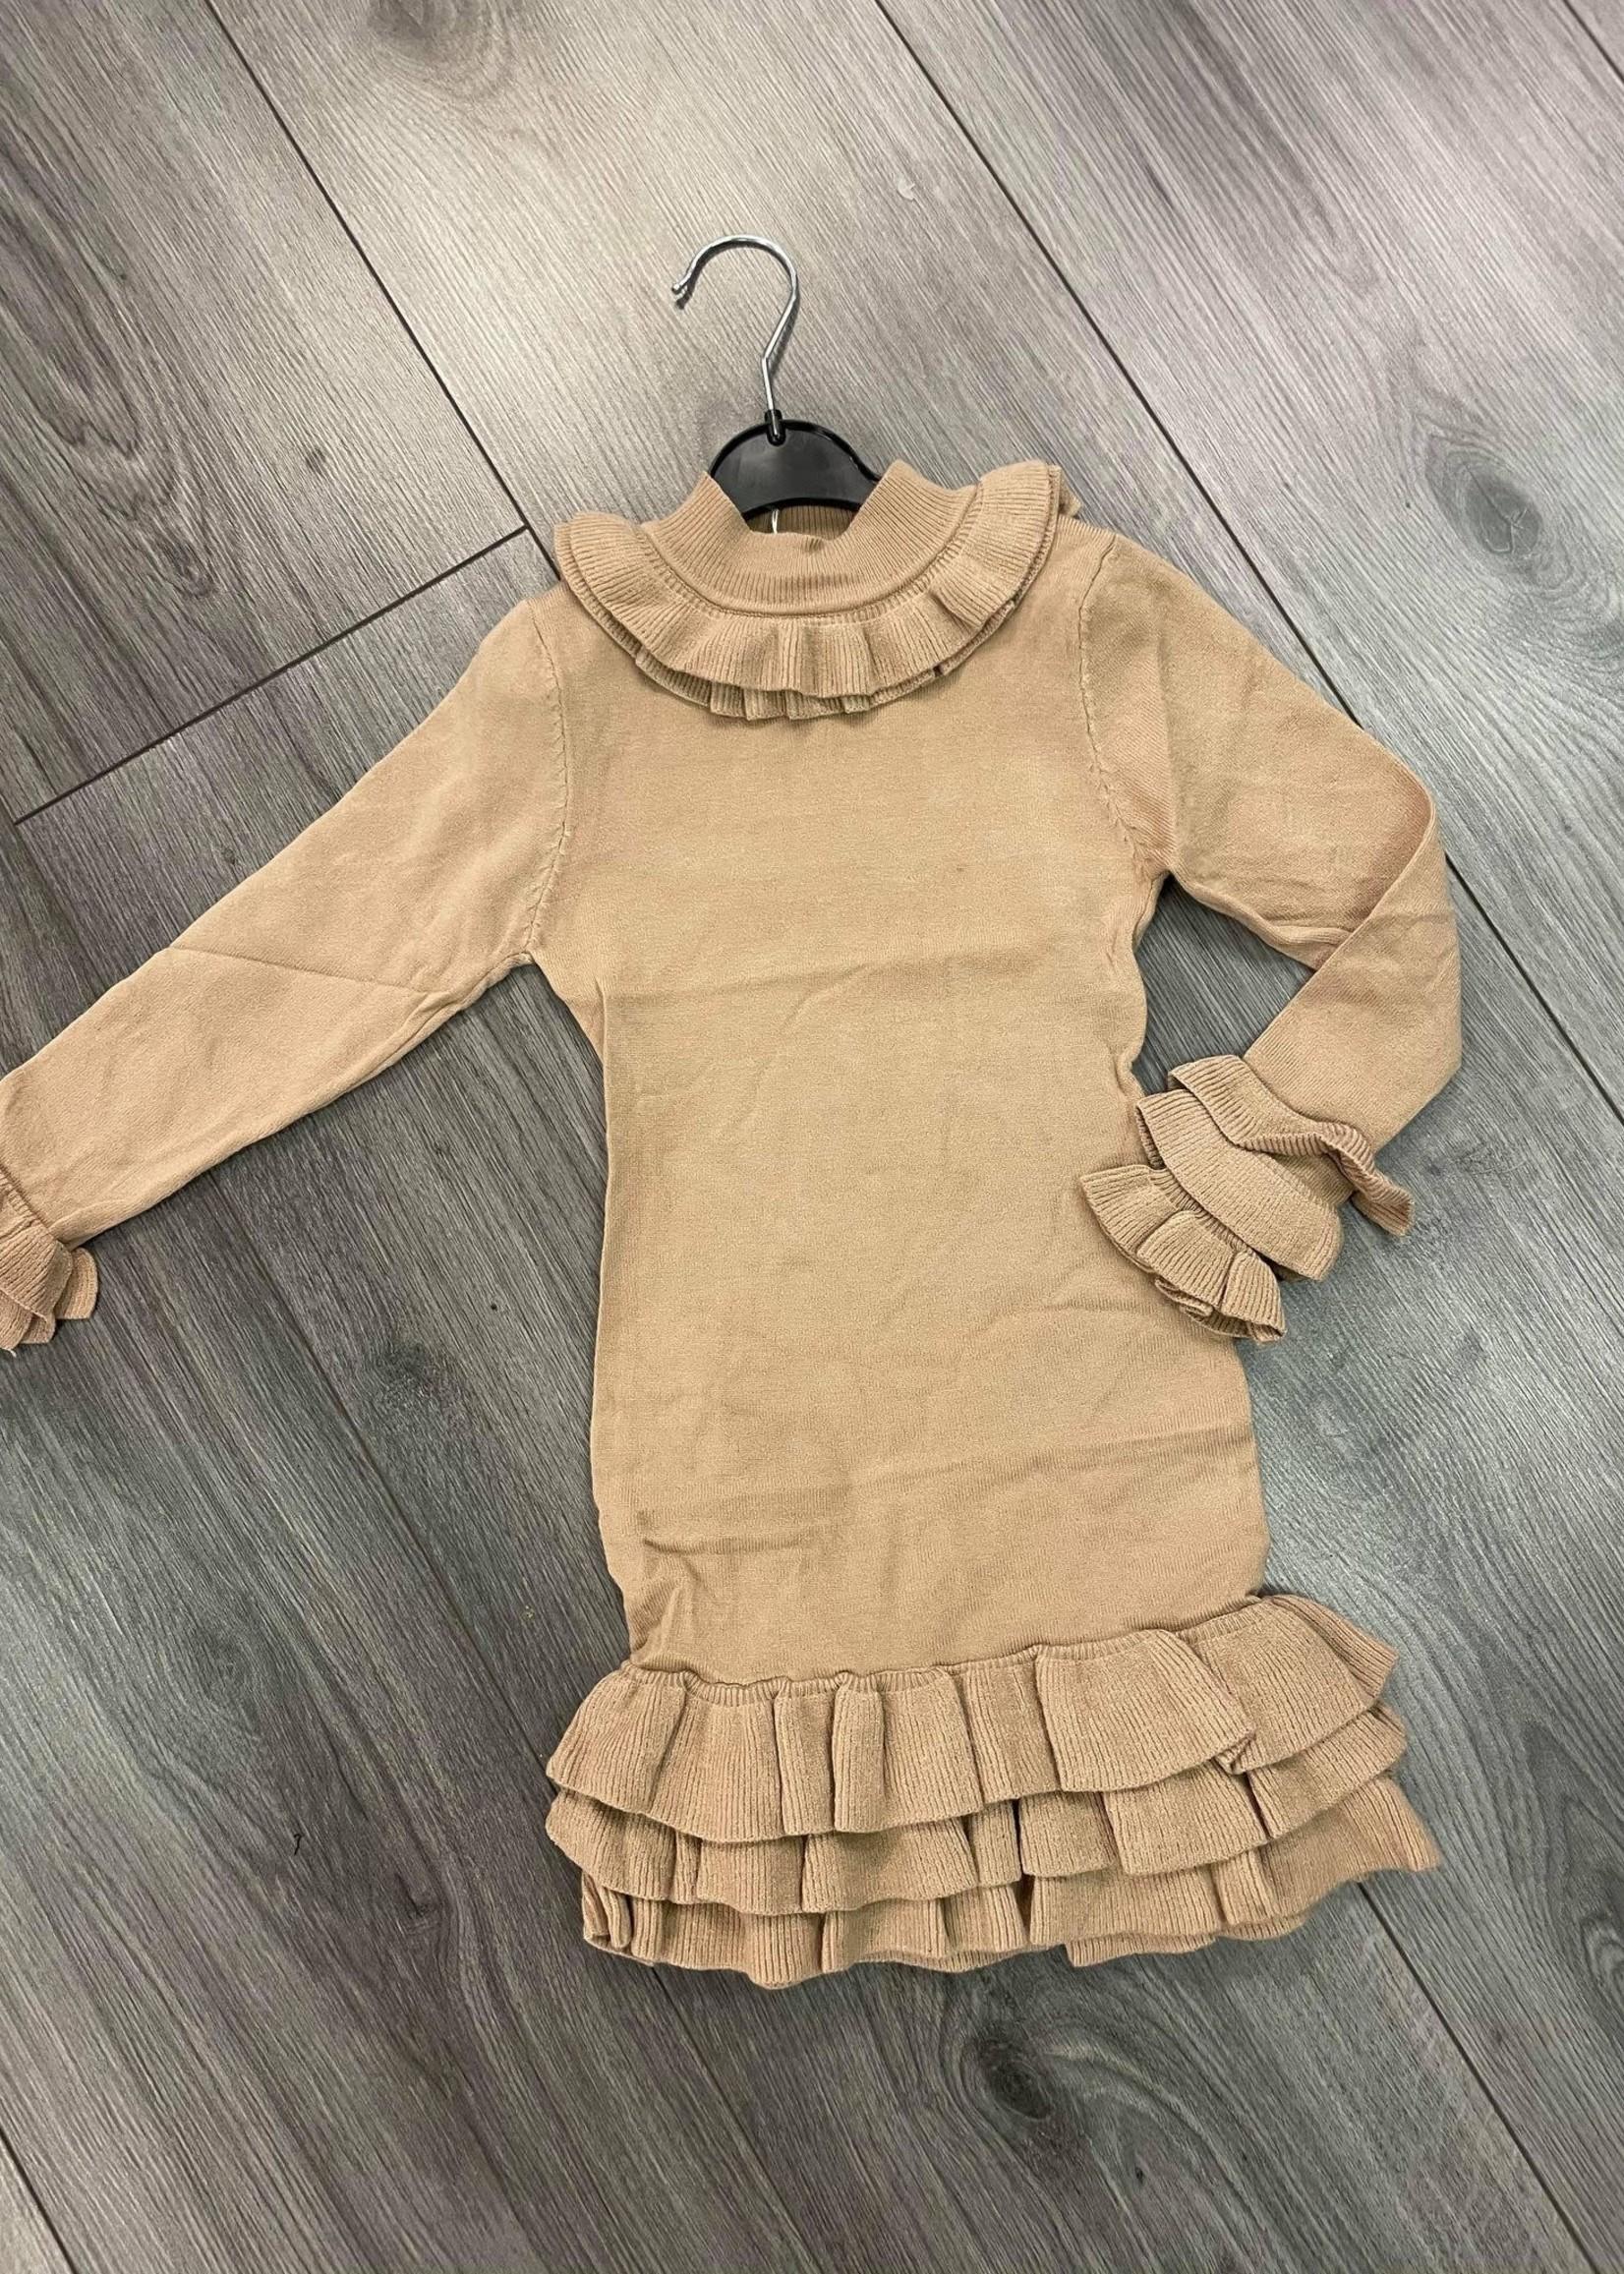 Divanis Ruffle Dress sand